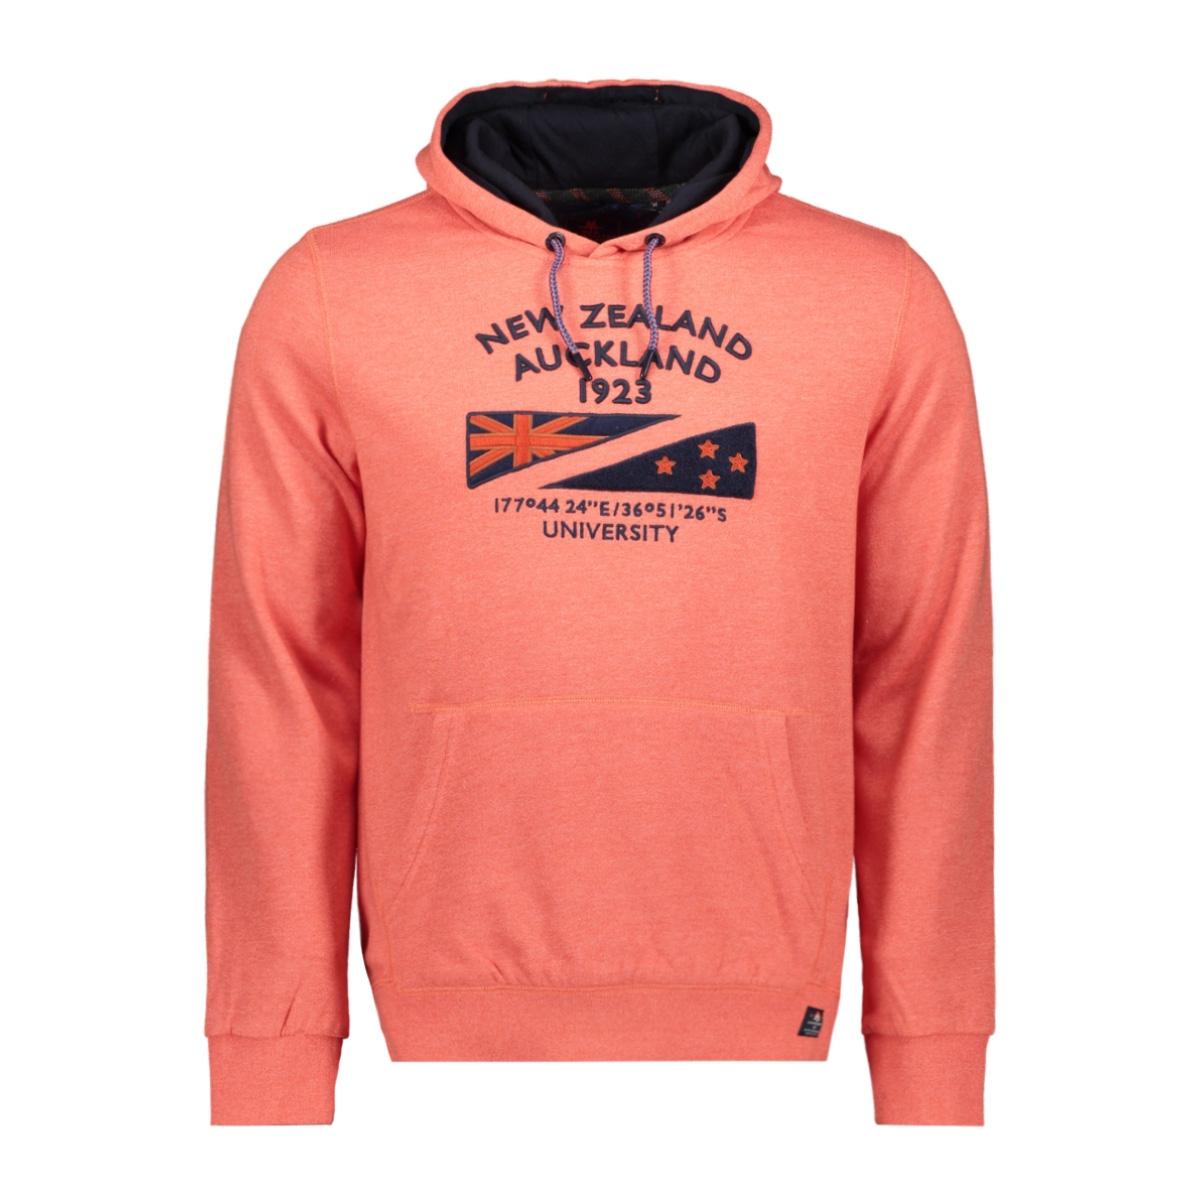 cambridge 19hn320 n.z.a. sweater 636 nza flame orange